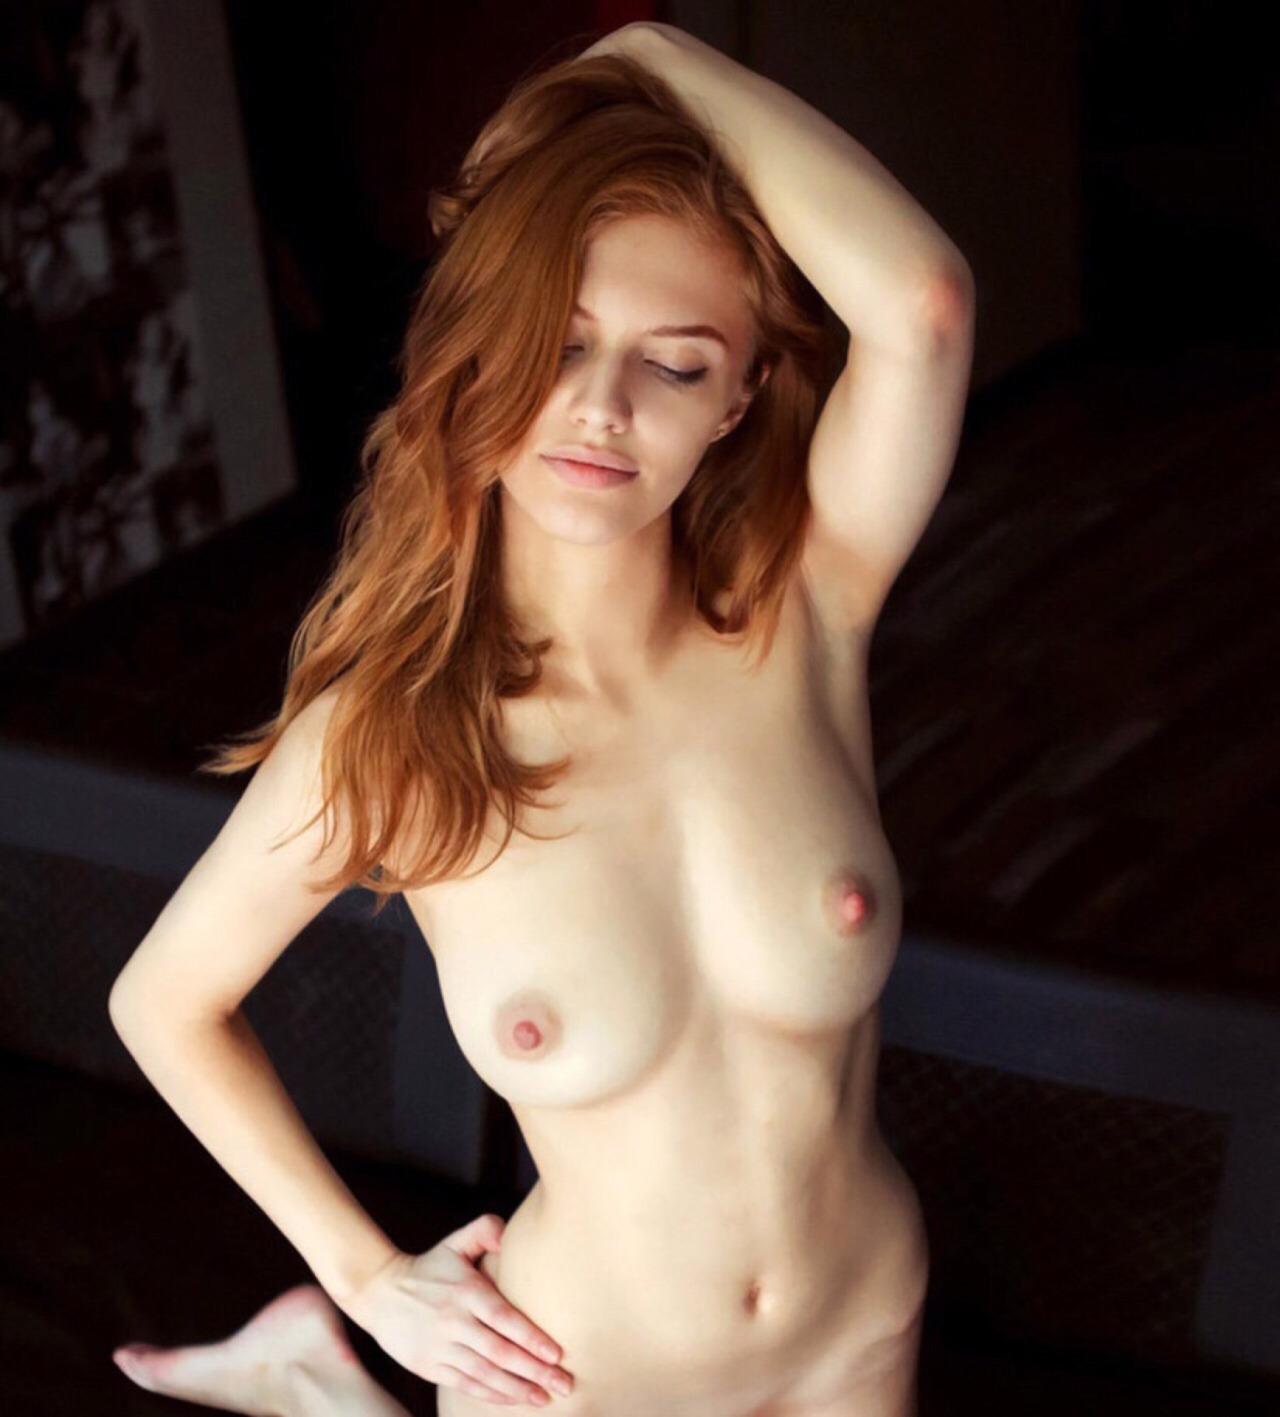 Free Lapdance Porn Galery